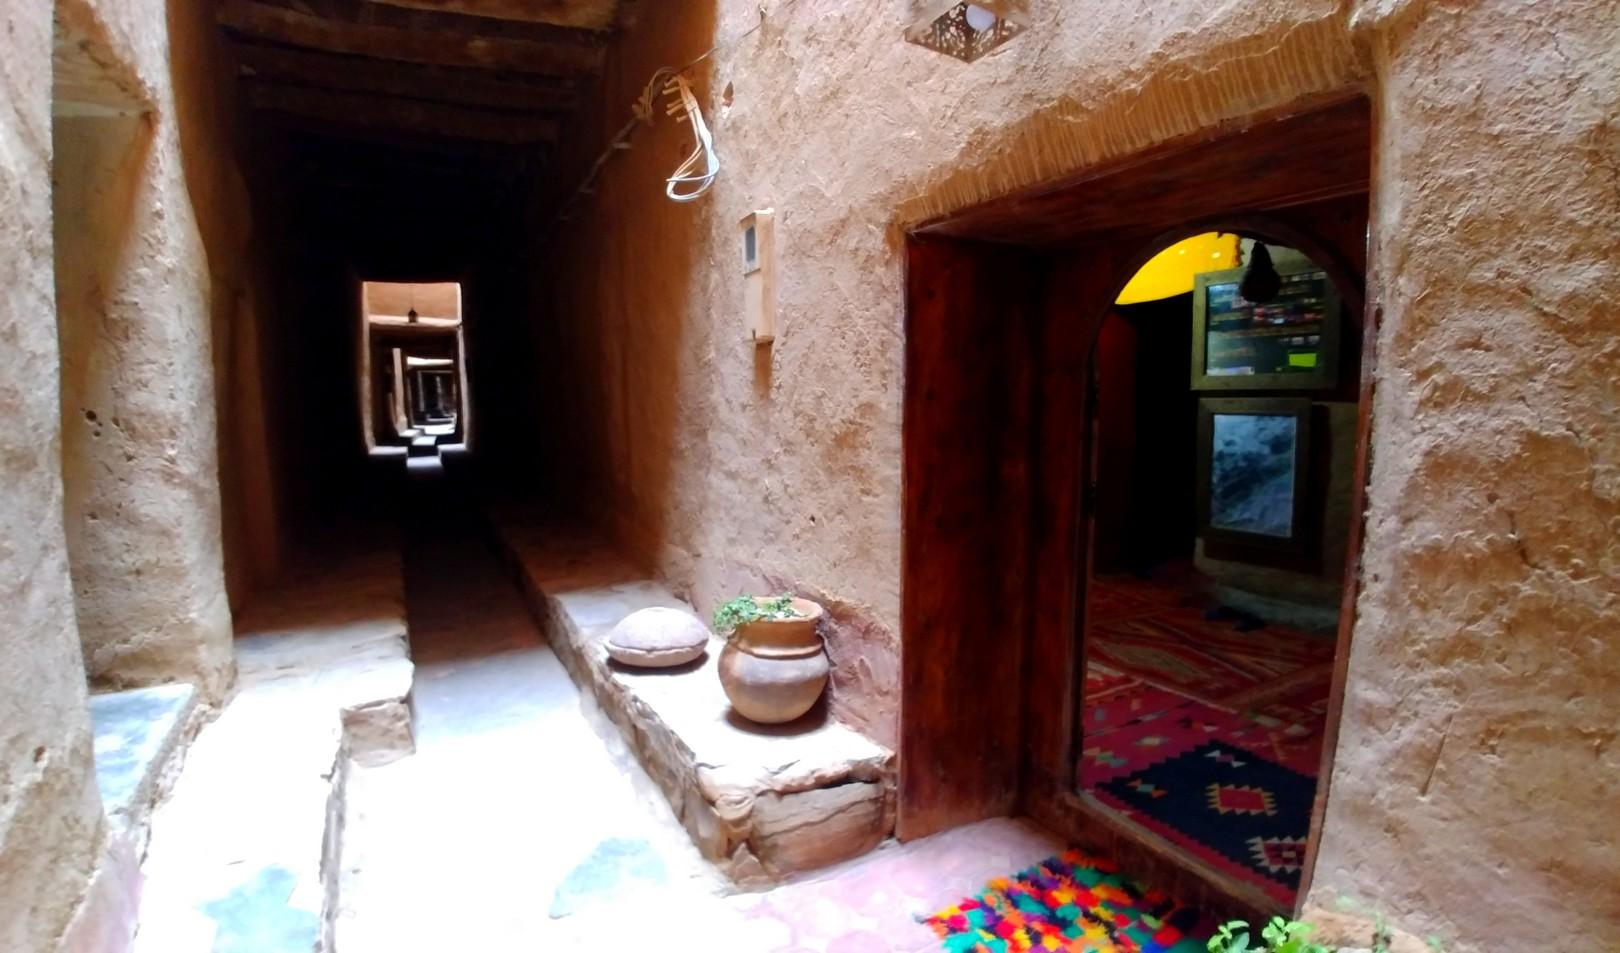 Maroc - Dans le ksar de Tinejdad